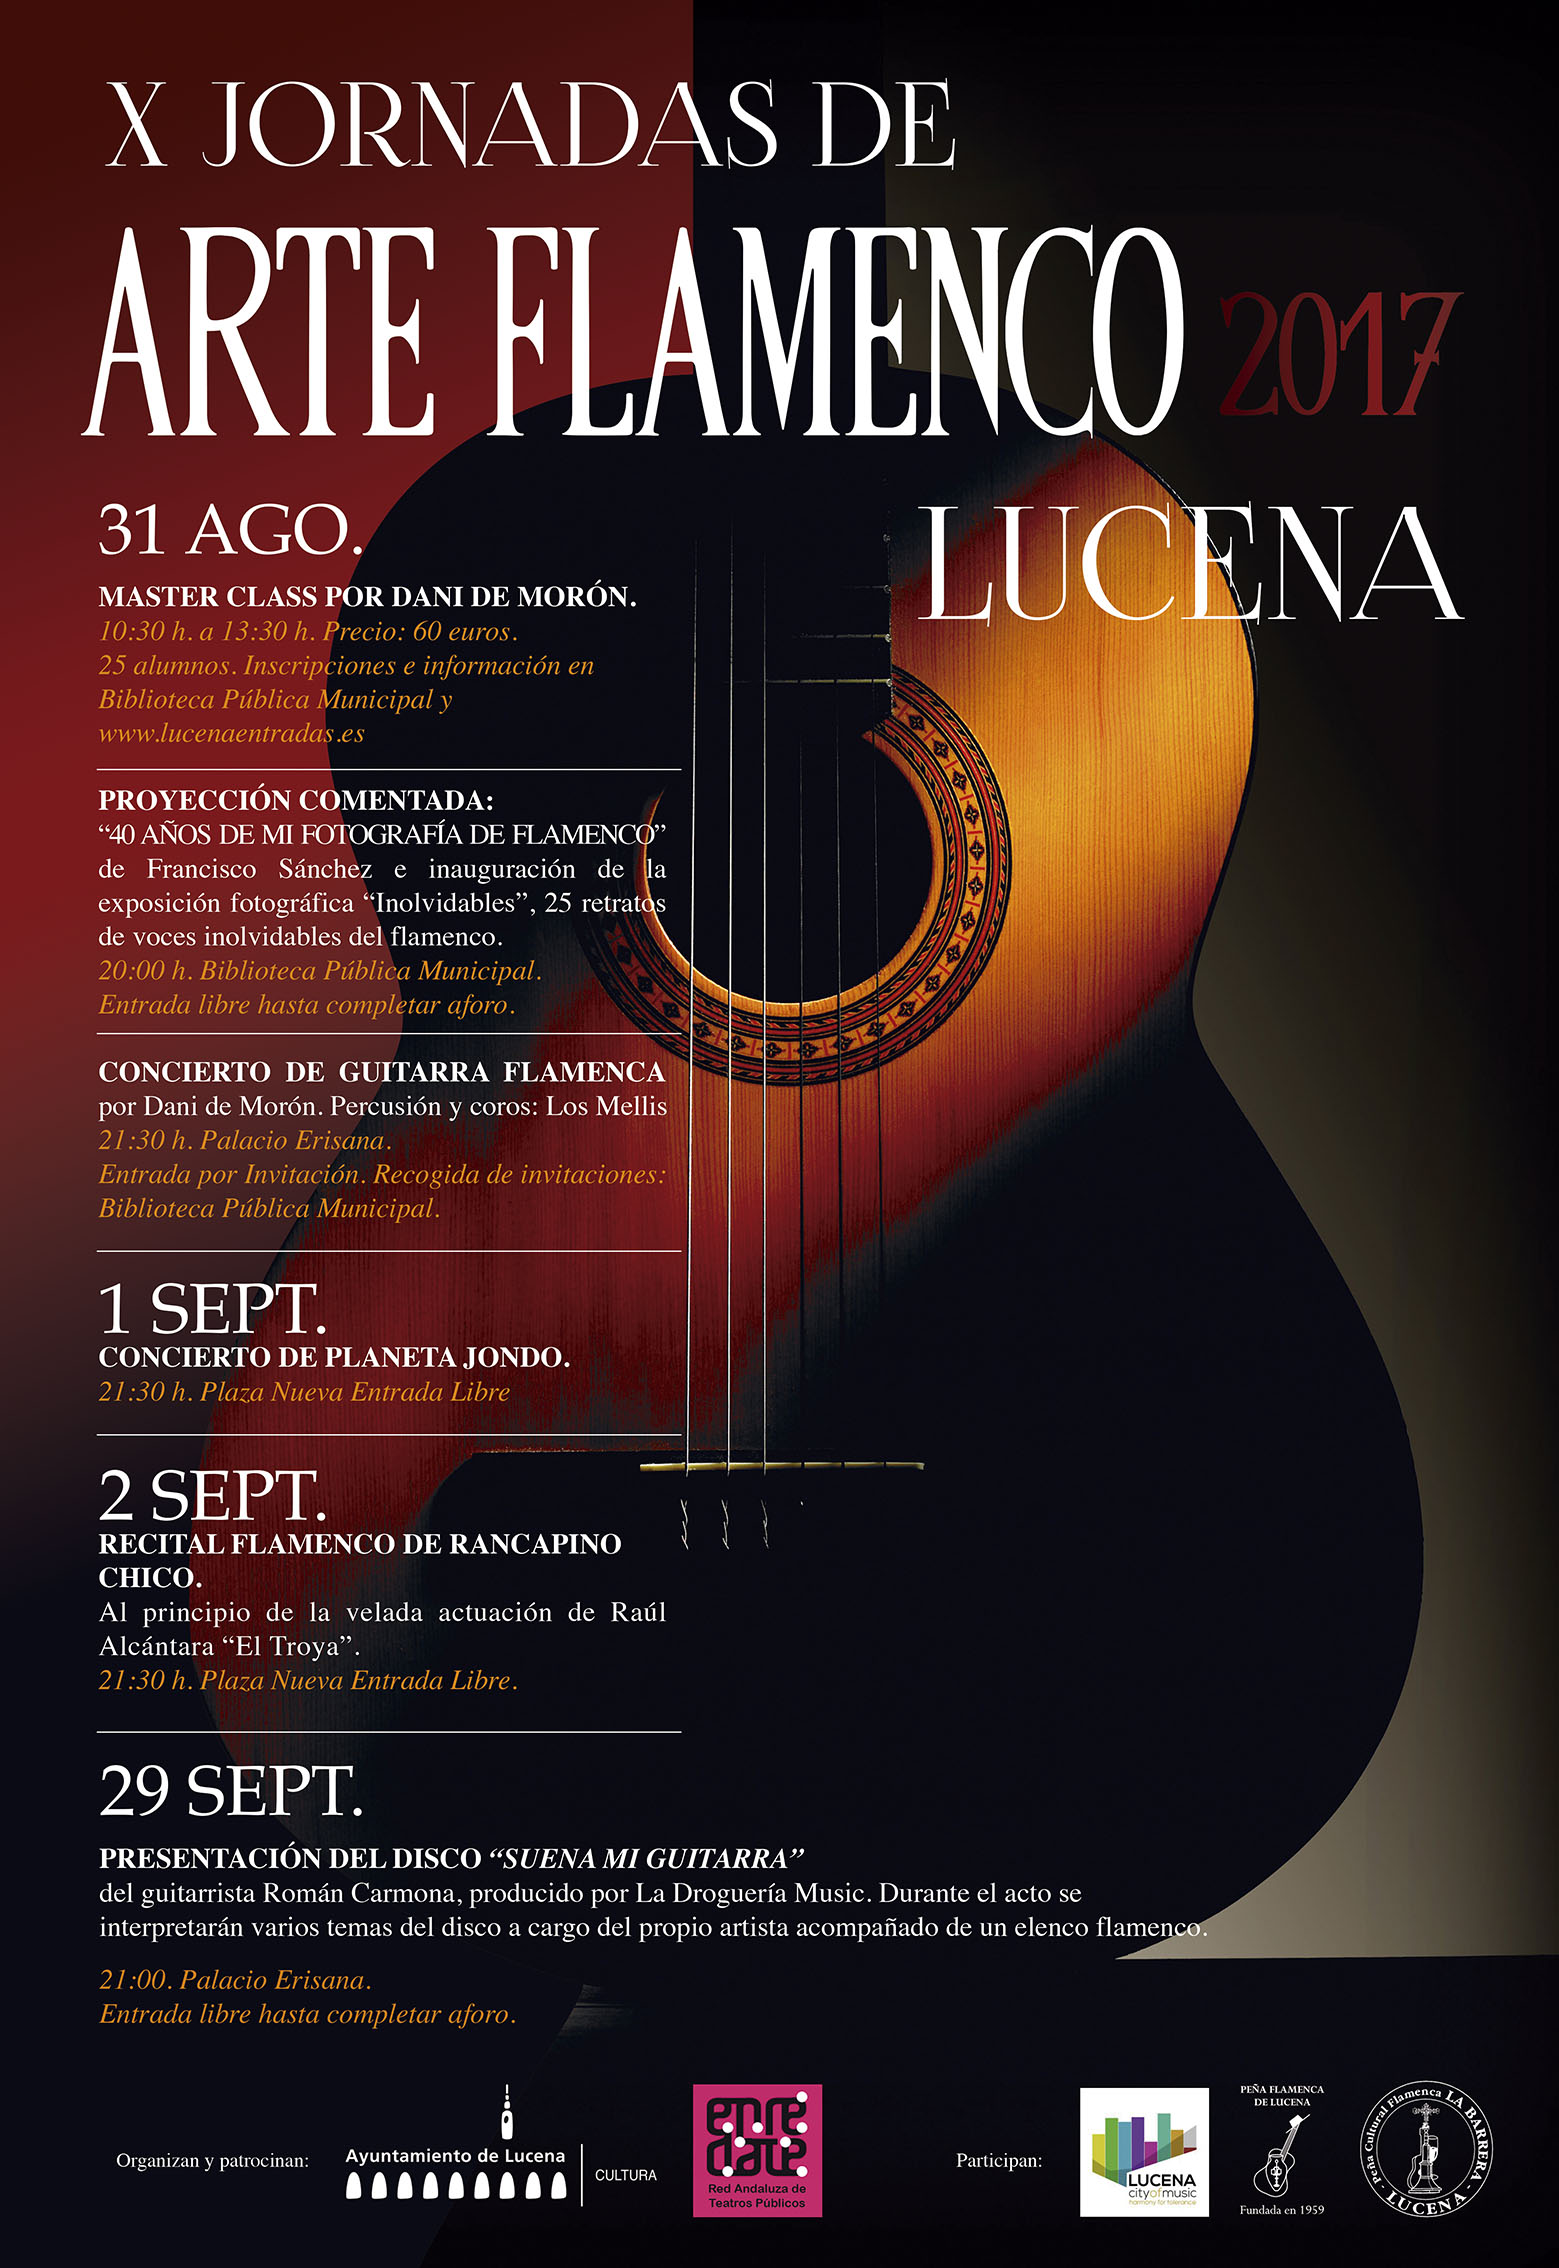 X Jornadas de Arte Flamenco: Concierto de Guitarra Flamenca @ Palacio Erisana